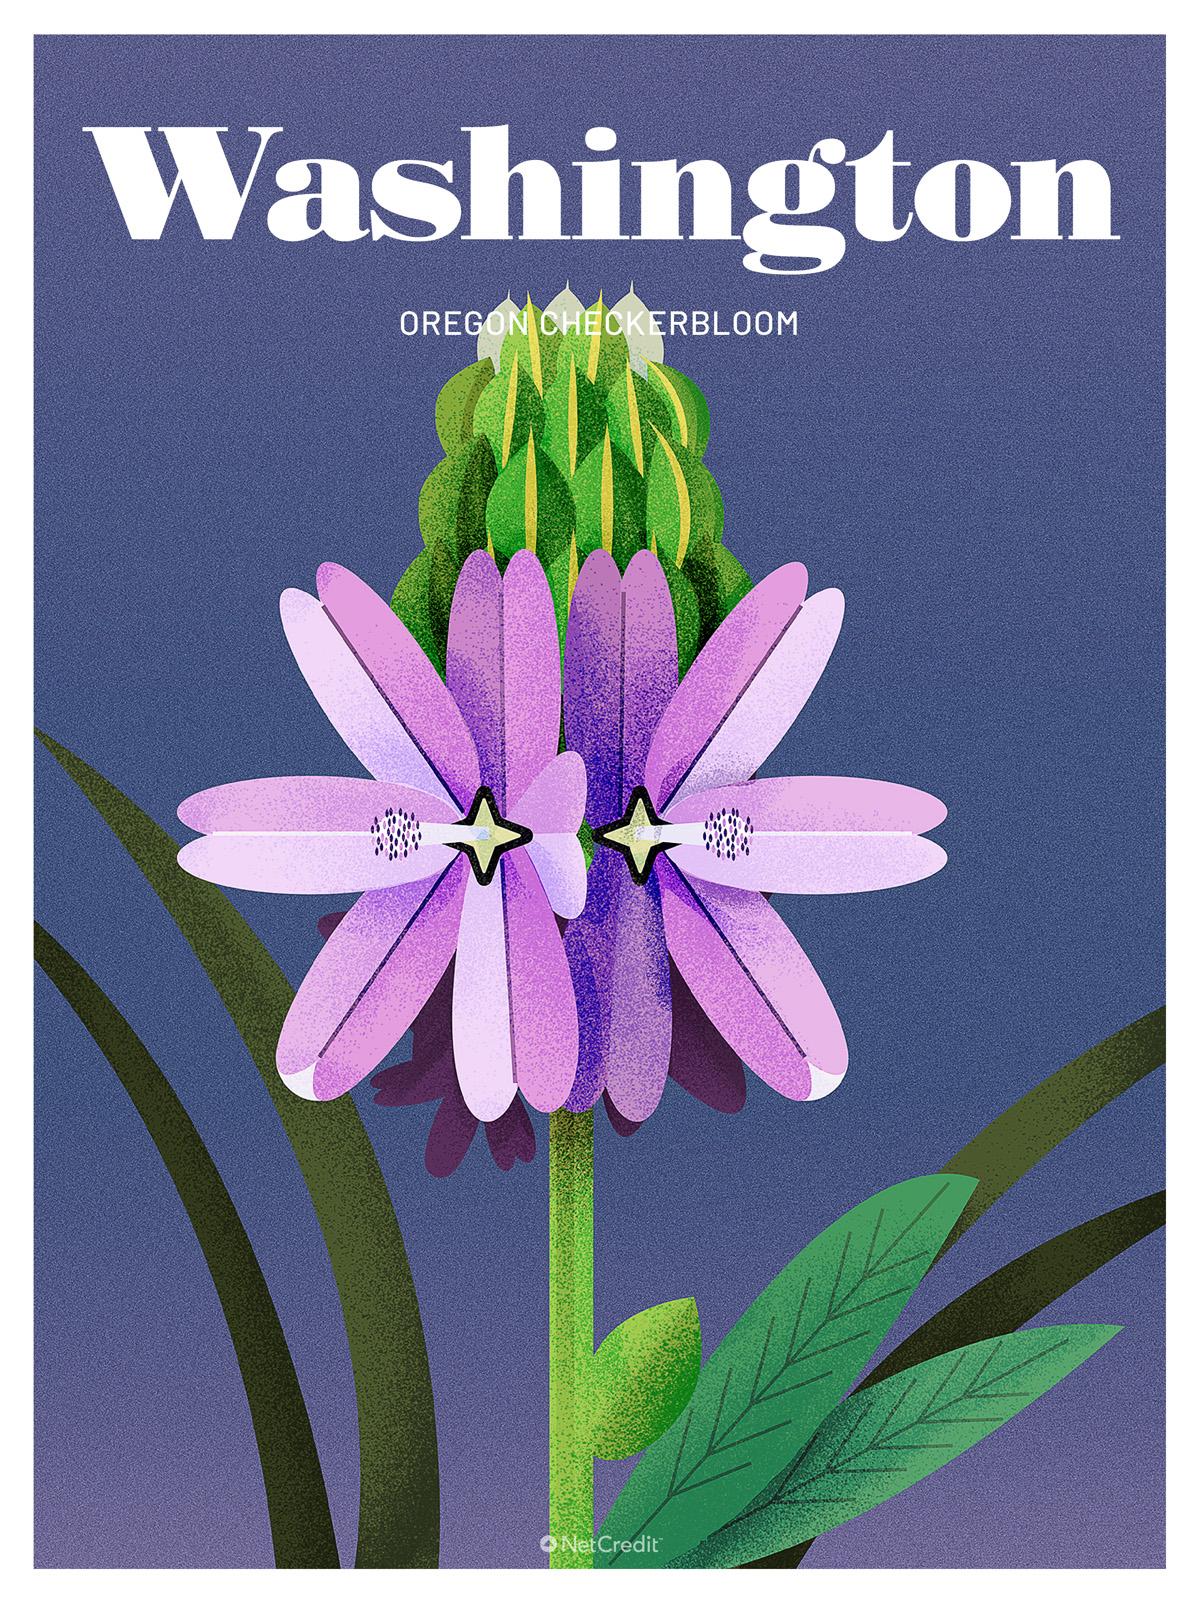 Endangered Plant in Washington: Oregon Checkerbloom